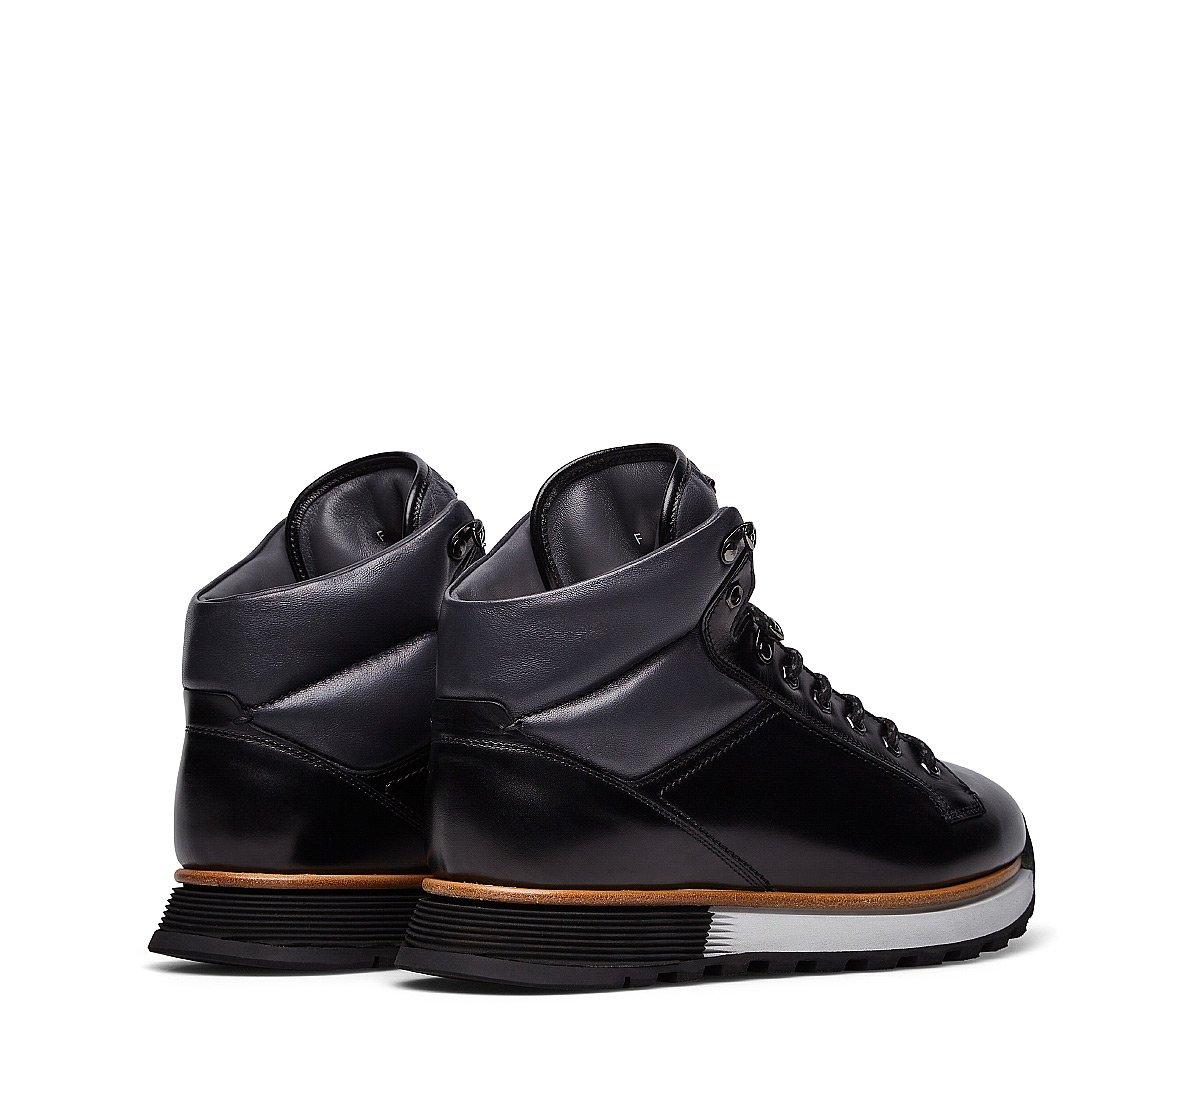 Miramonti Boots